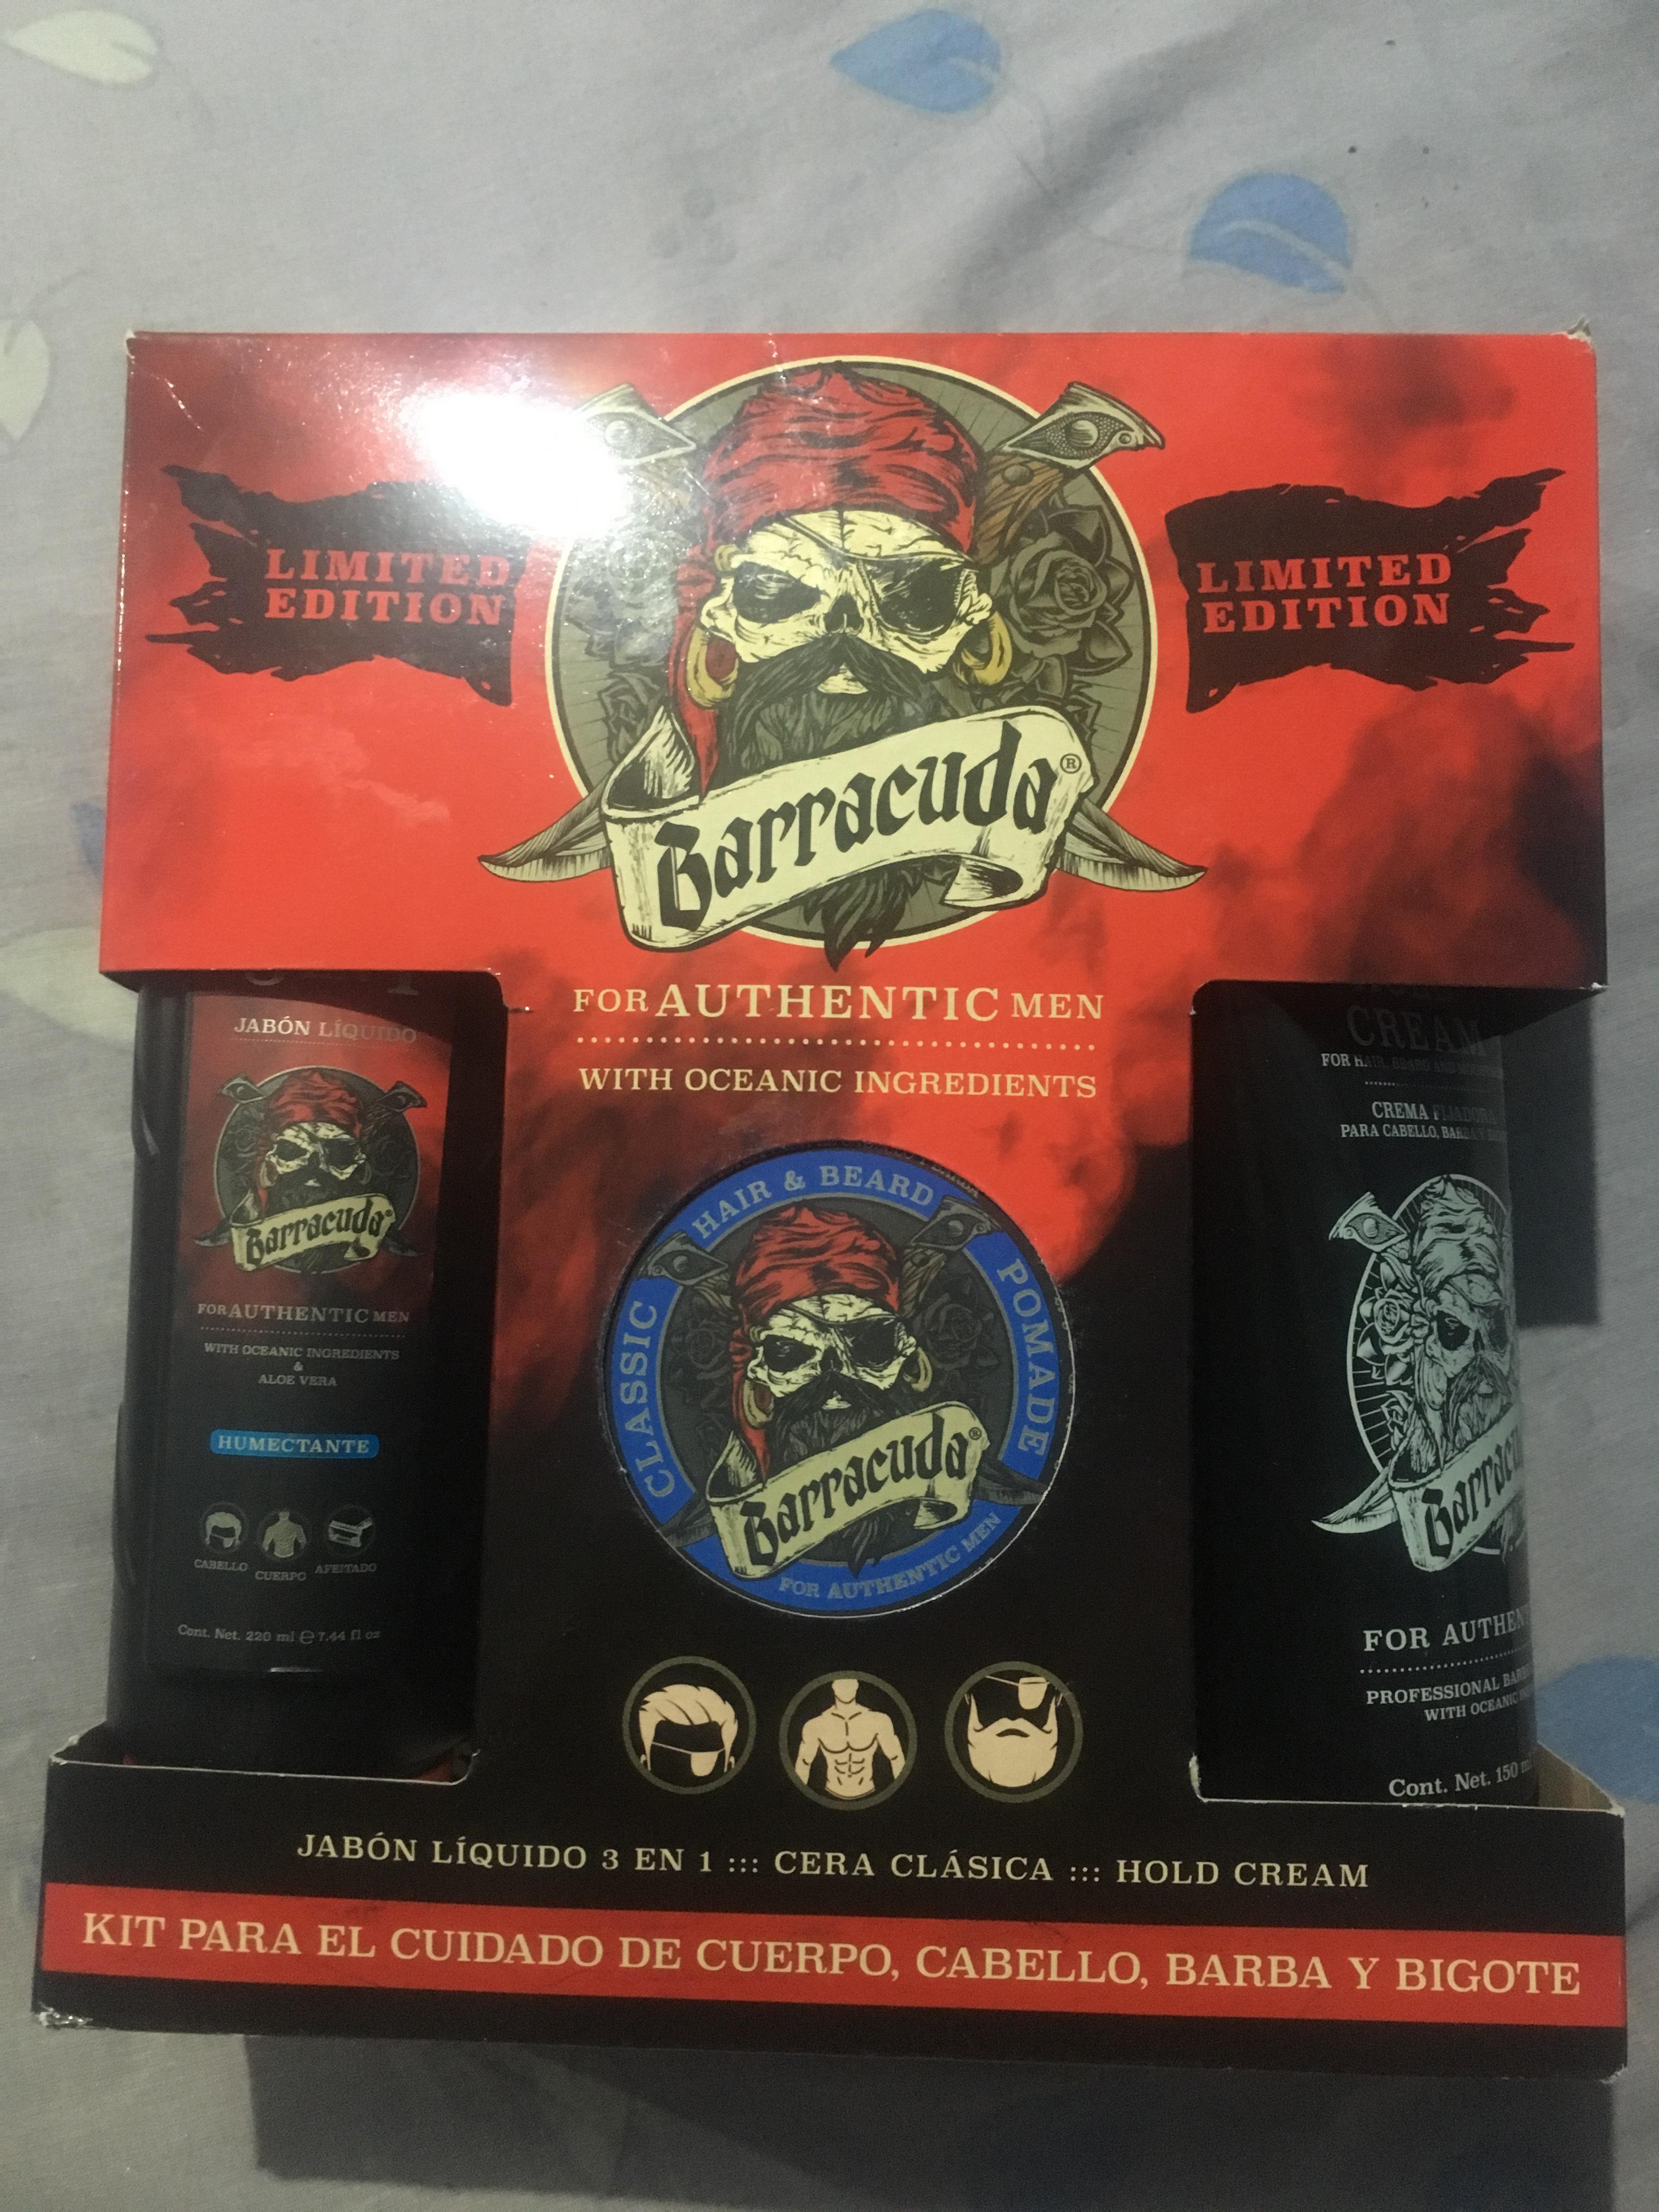 Bodega Aurrerá: kit barracuda (jabón, cera y crema)